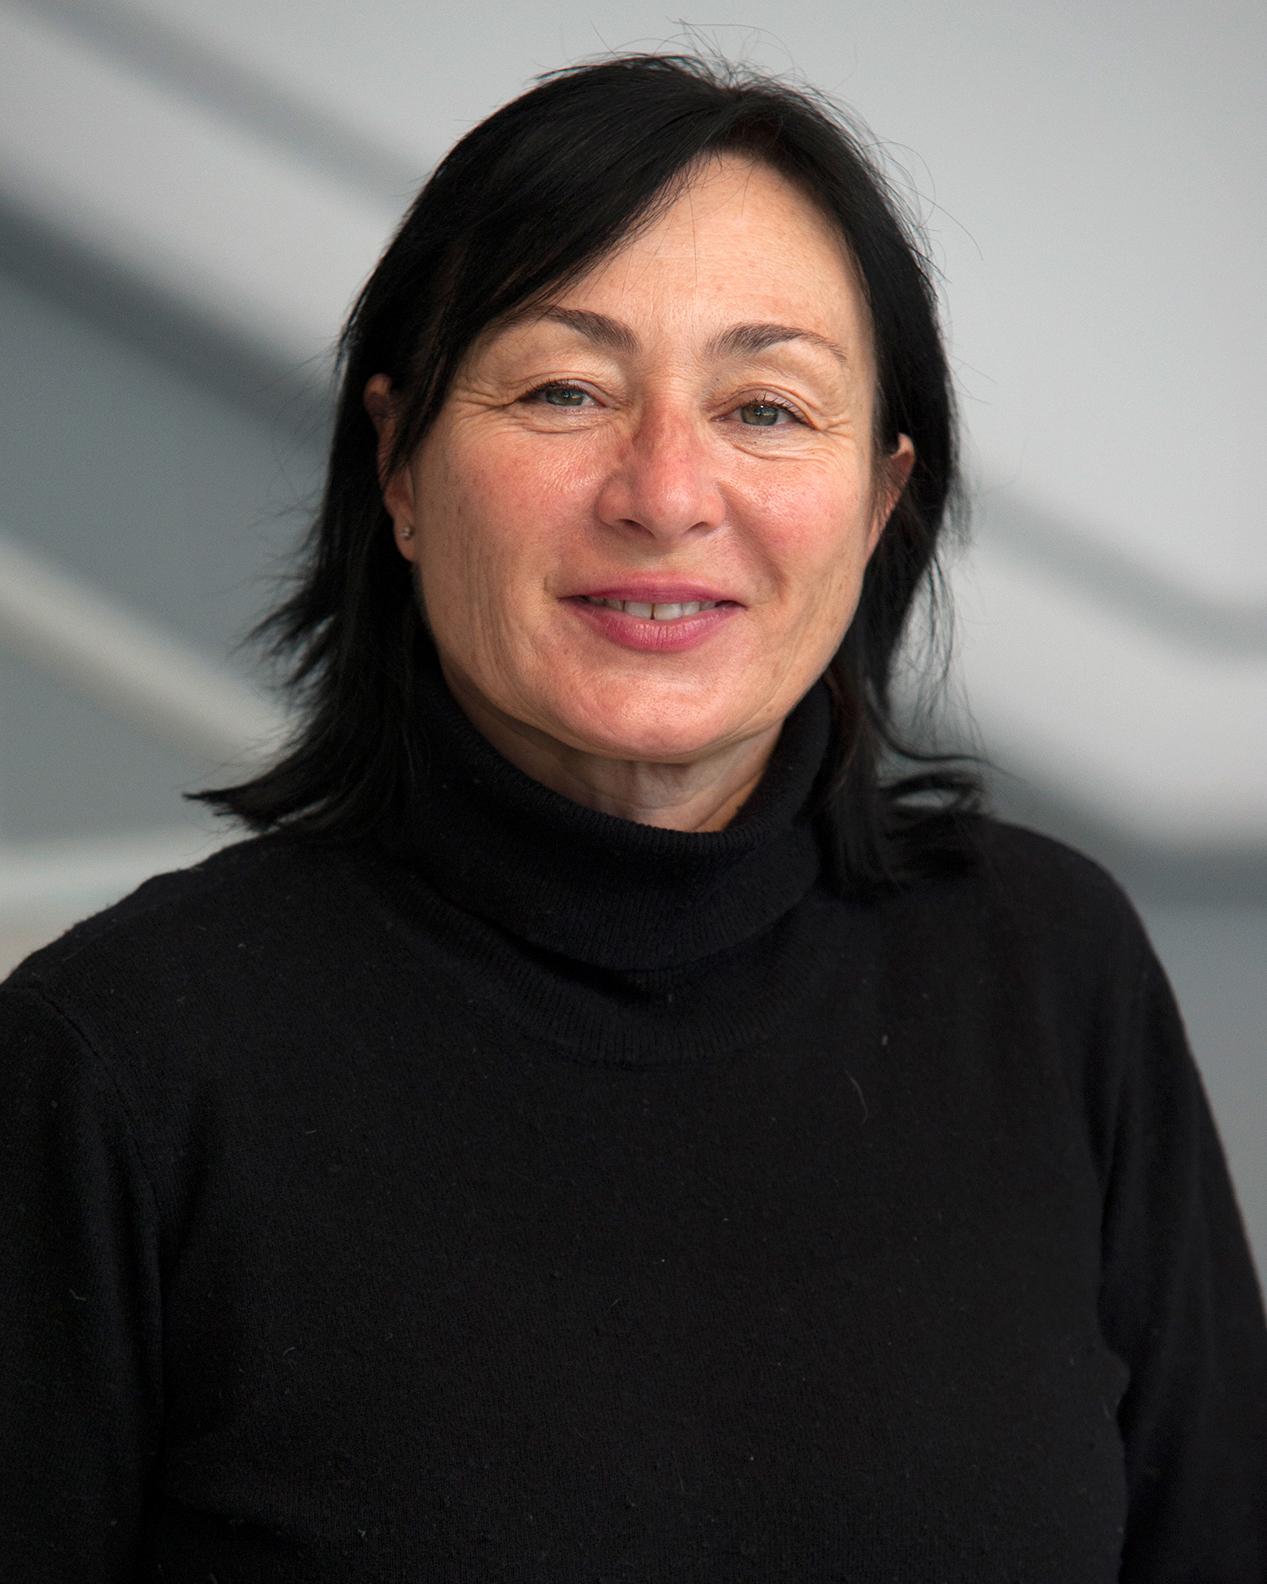 Géraldine Pinault